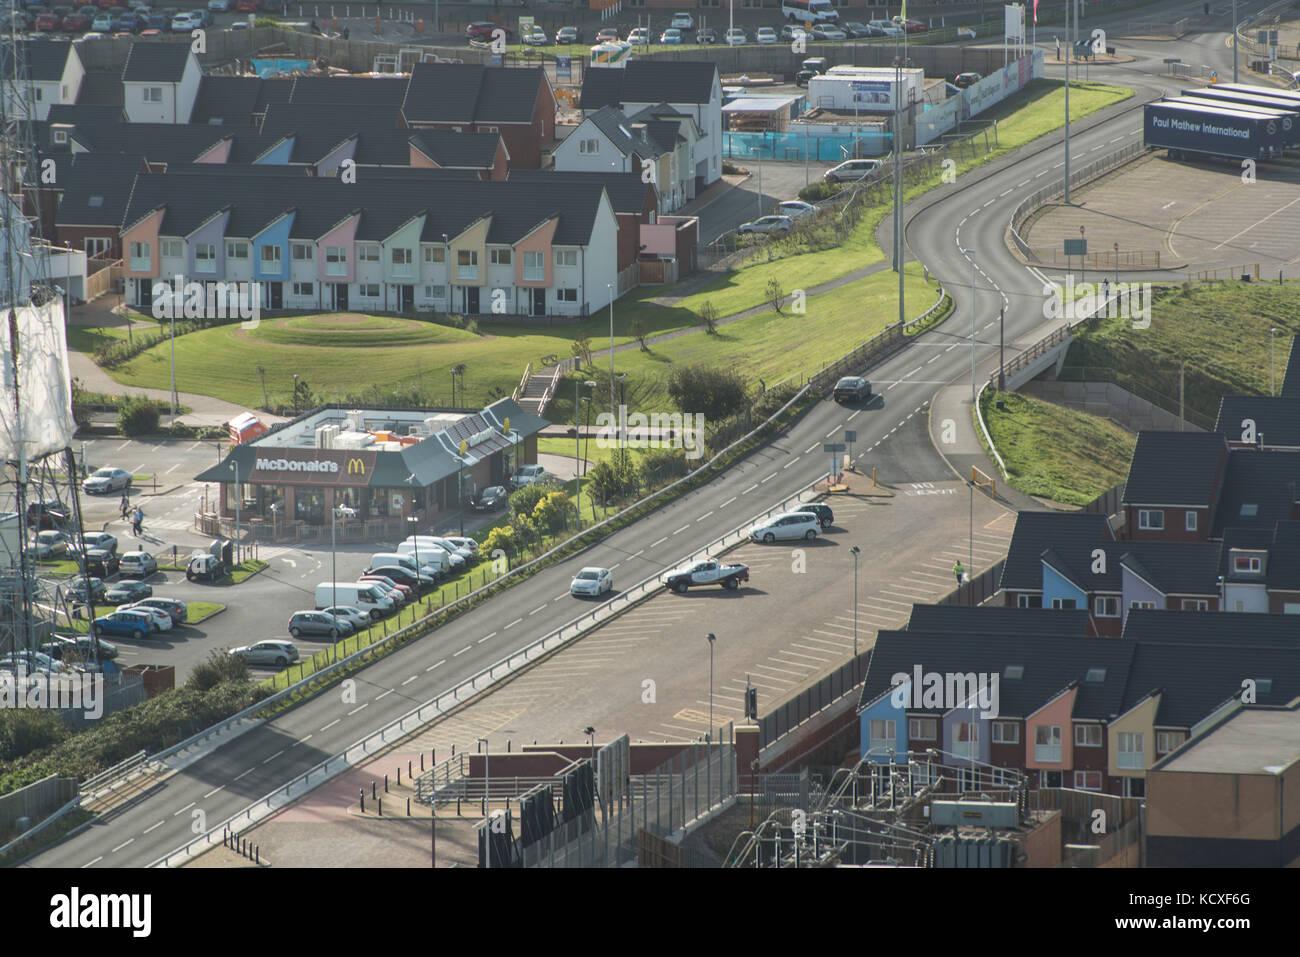 McDonalds restaurant Rigby Road Blackpool close to Seasiders way. Lancashire. Credit Lee Ramsden / ALAMY - Stock Image